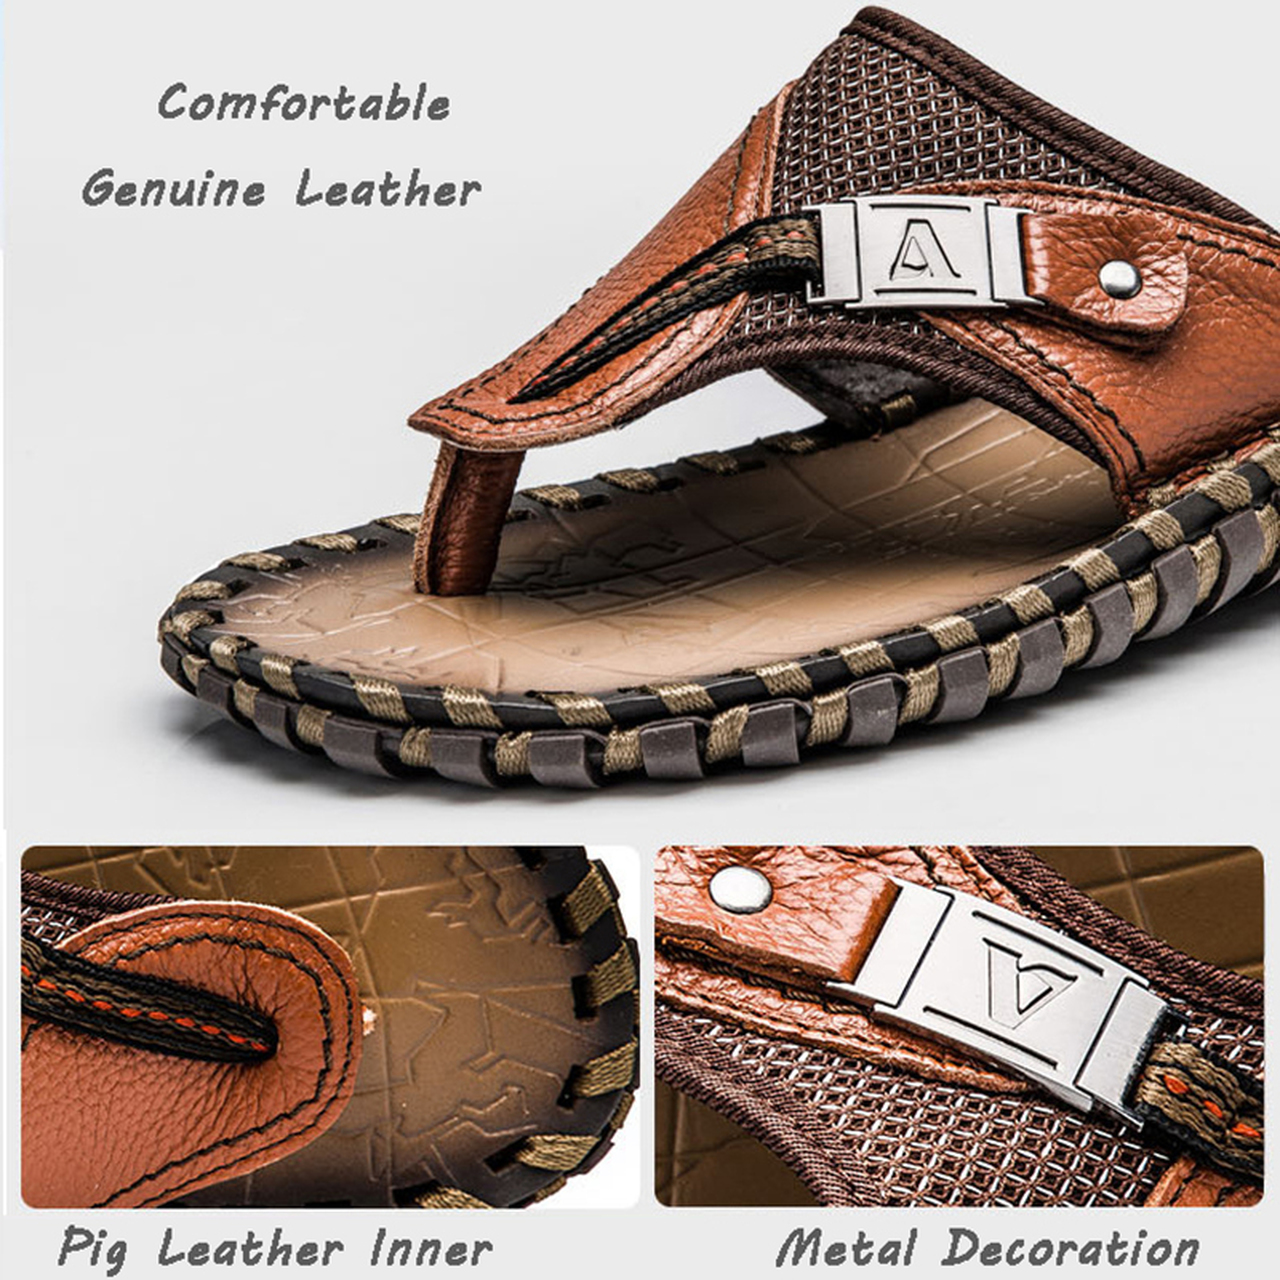 0818de68d470d8 ... Merkmak Luxury Brand 2018 New Men s Flip Flops Genuine Leather Slippers  Summer Fashion Beach Sandals Shoes ...